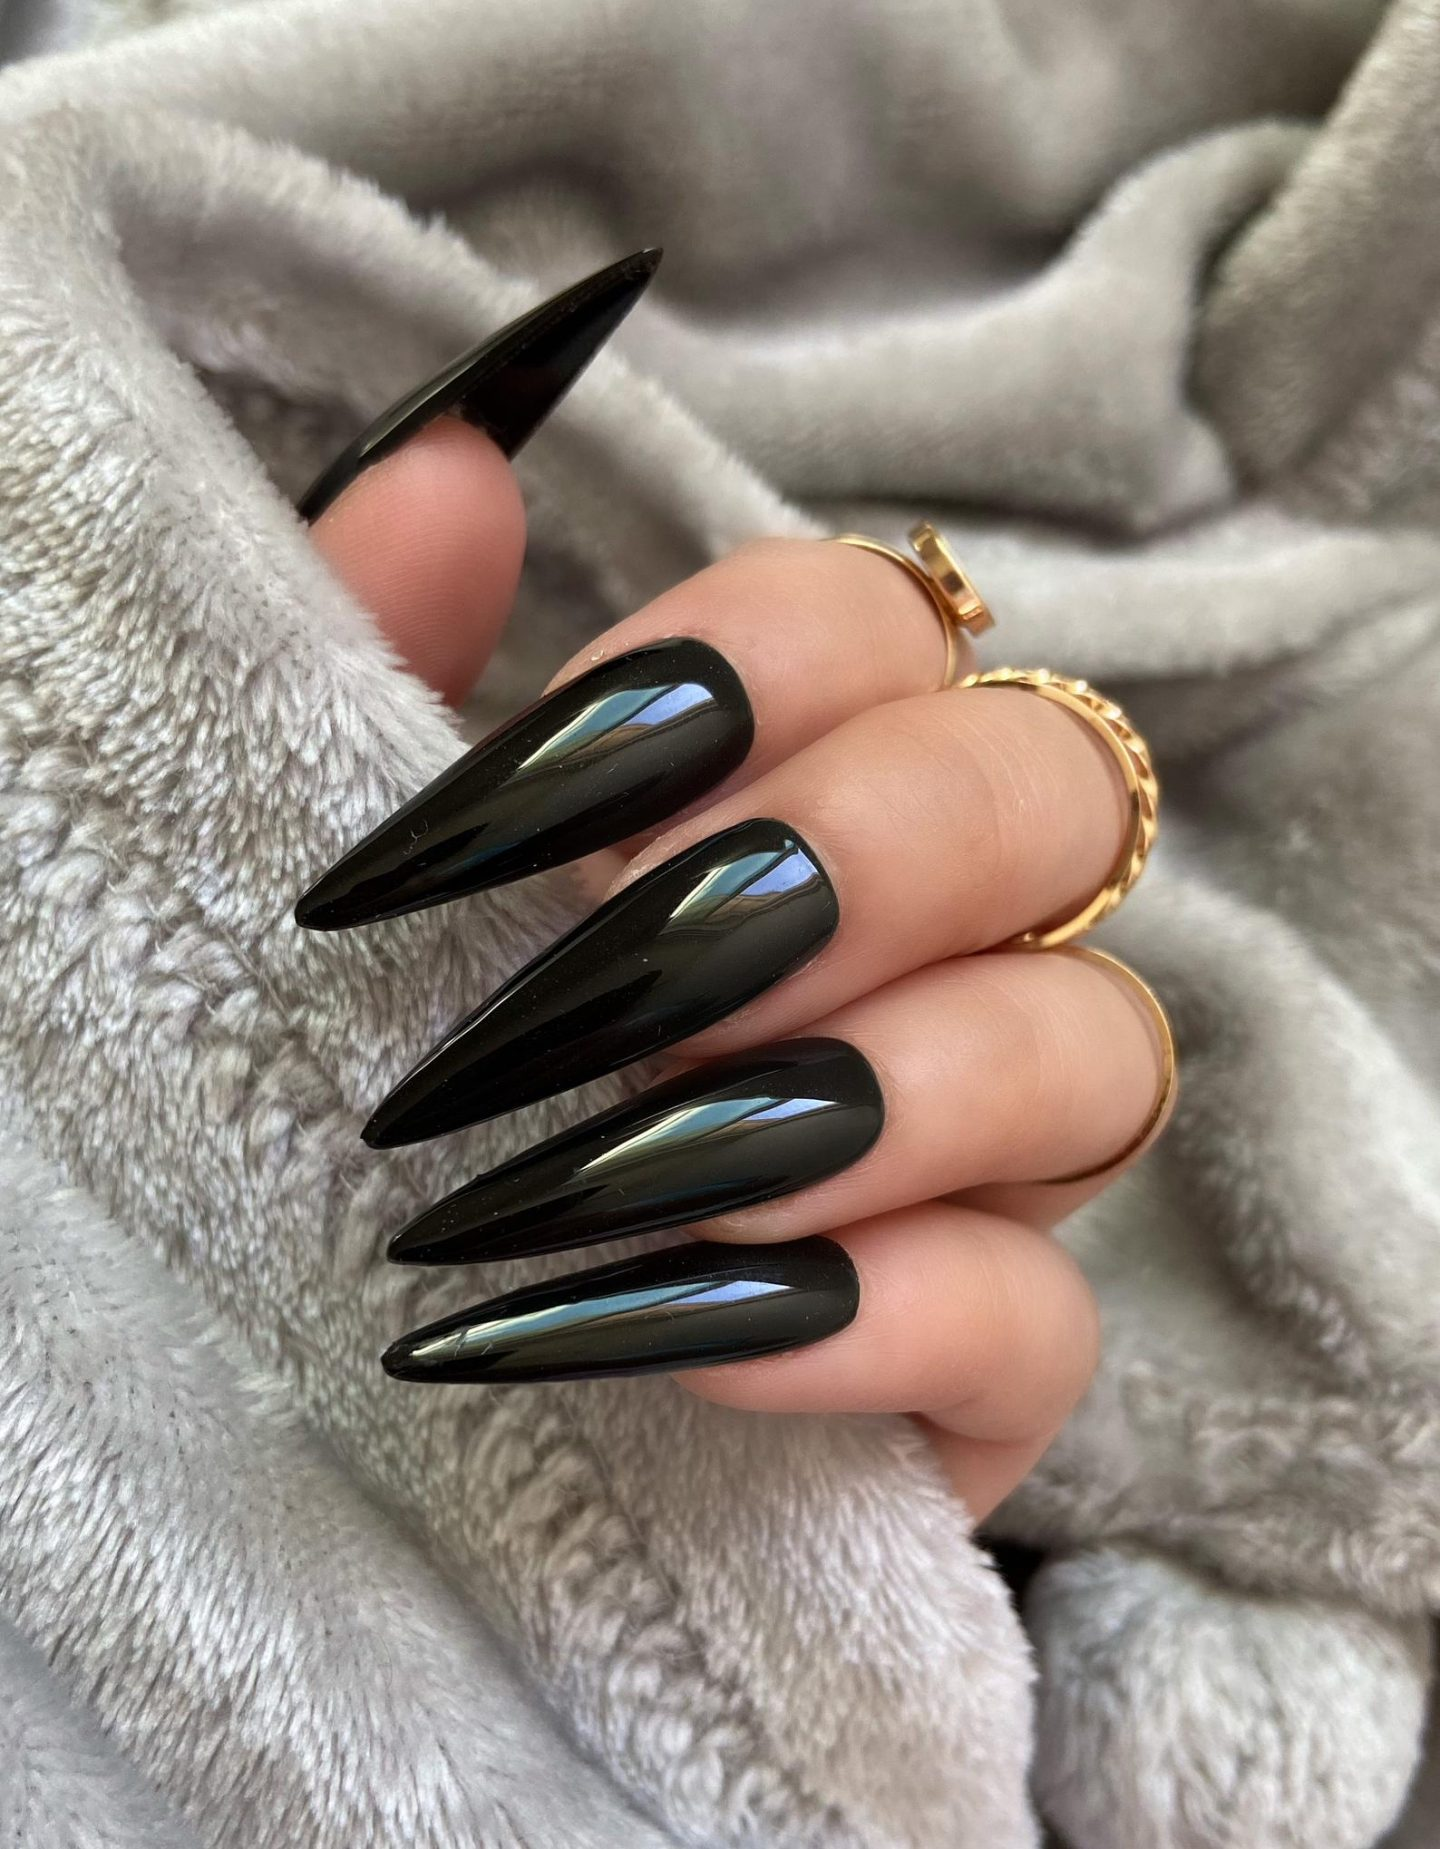 Long glossy black stiletto nails